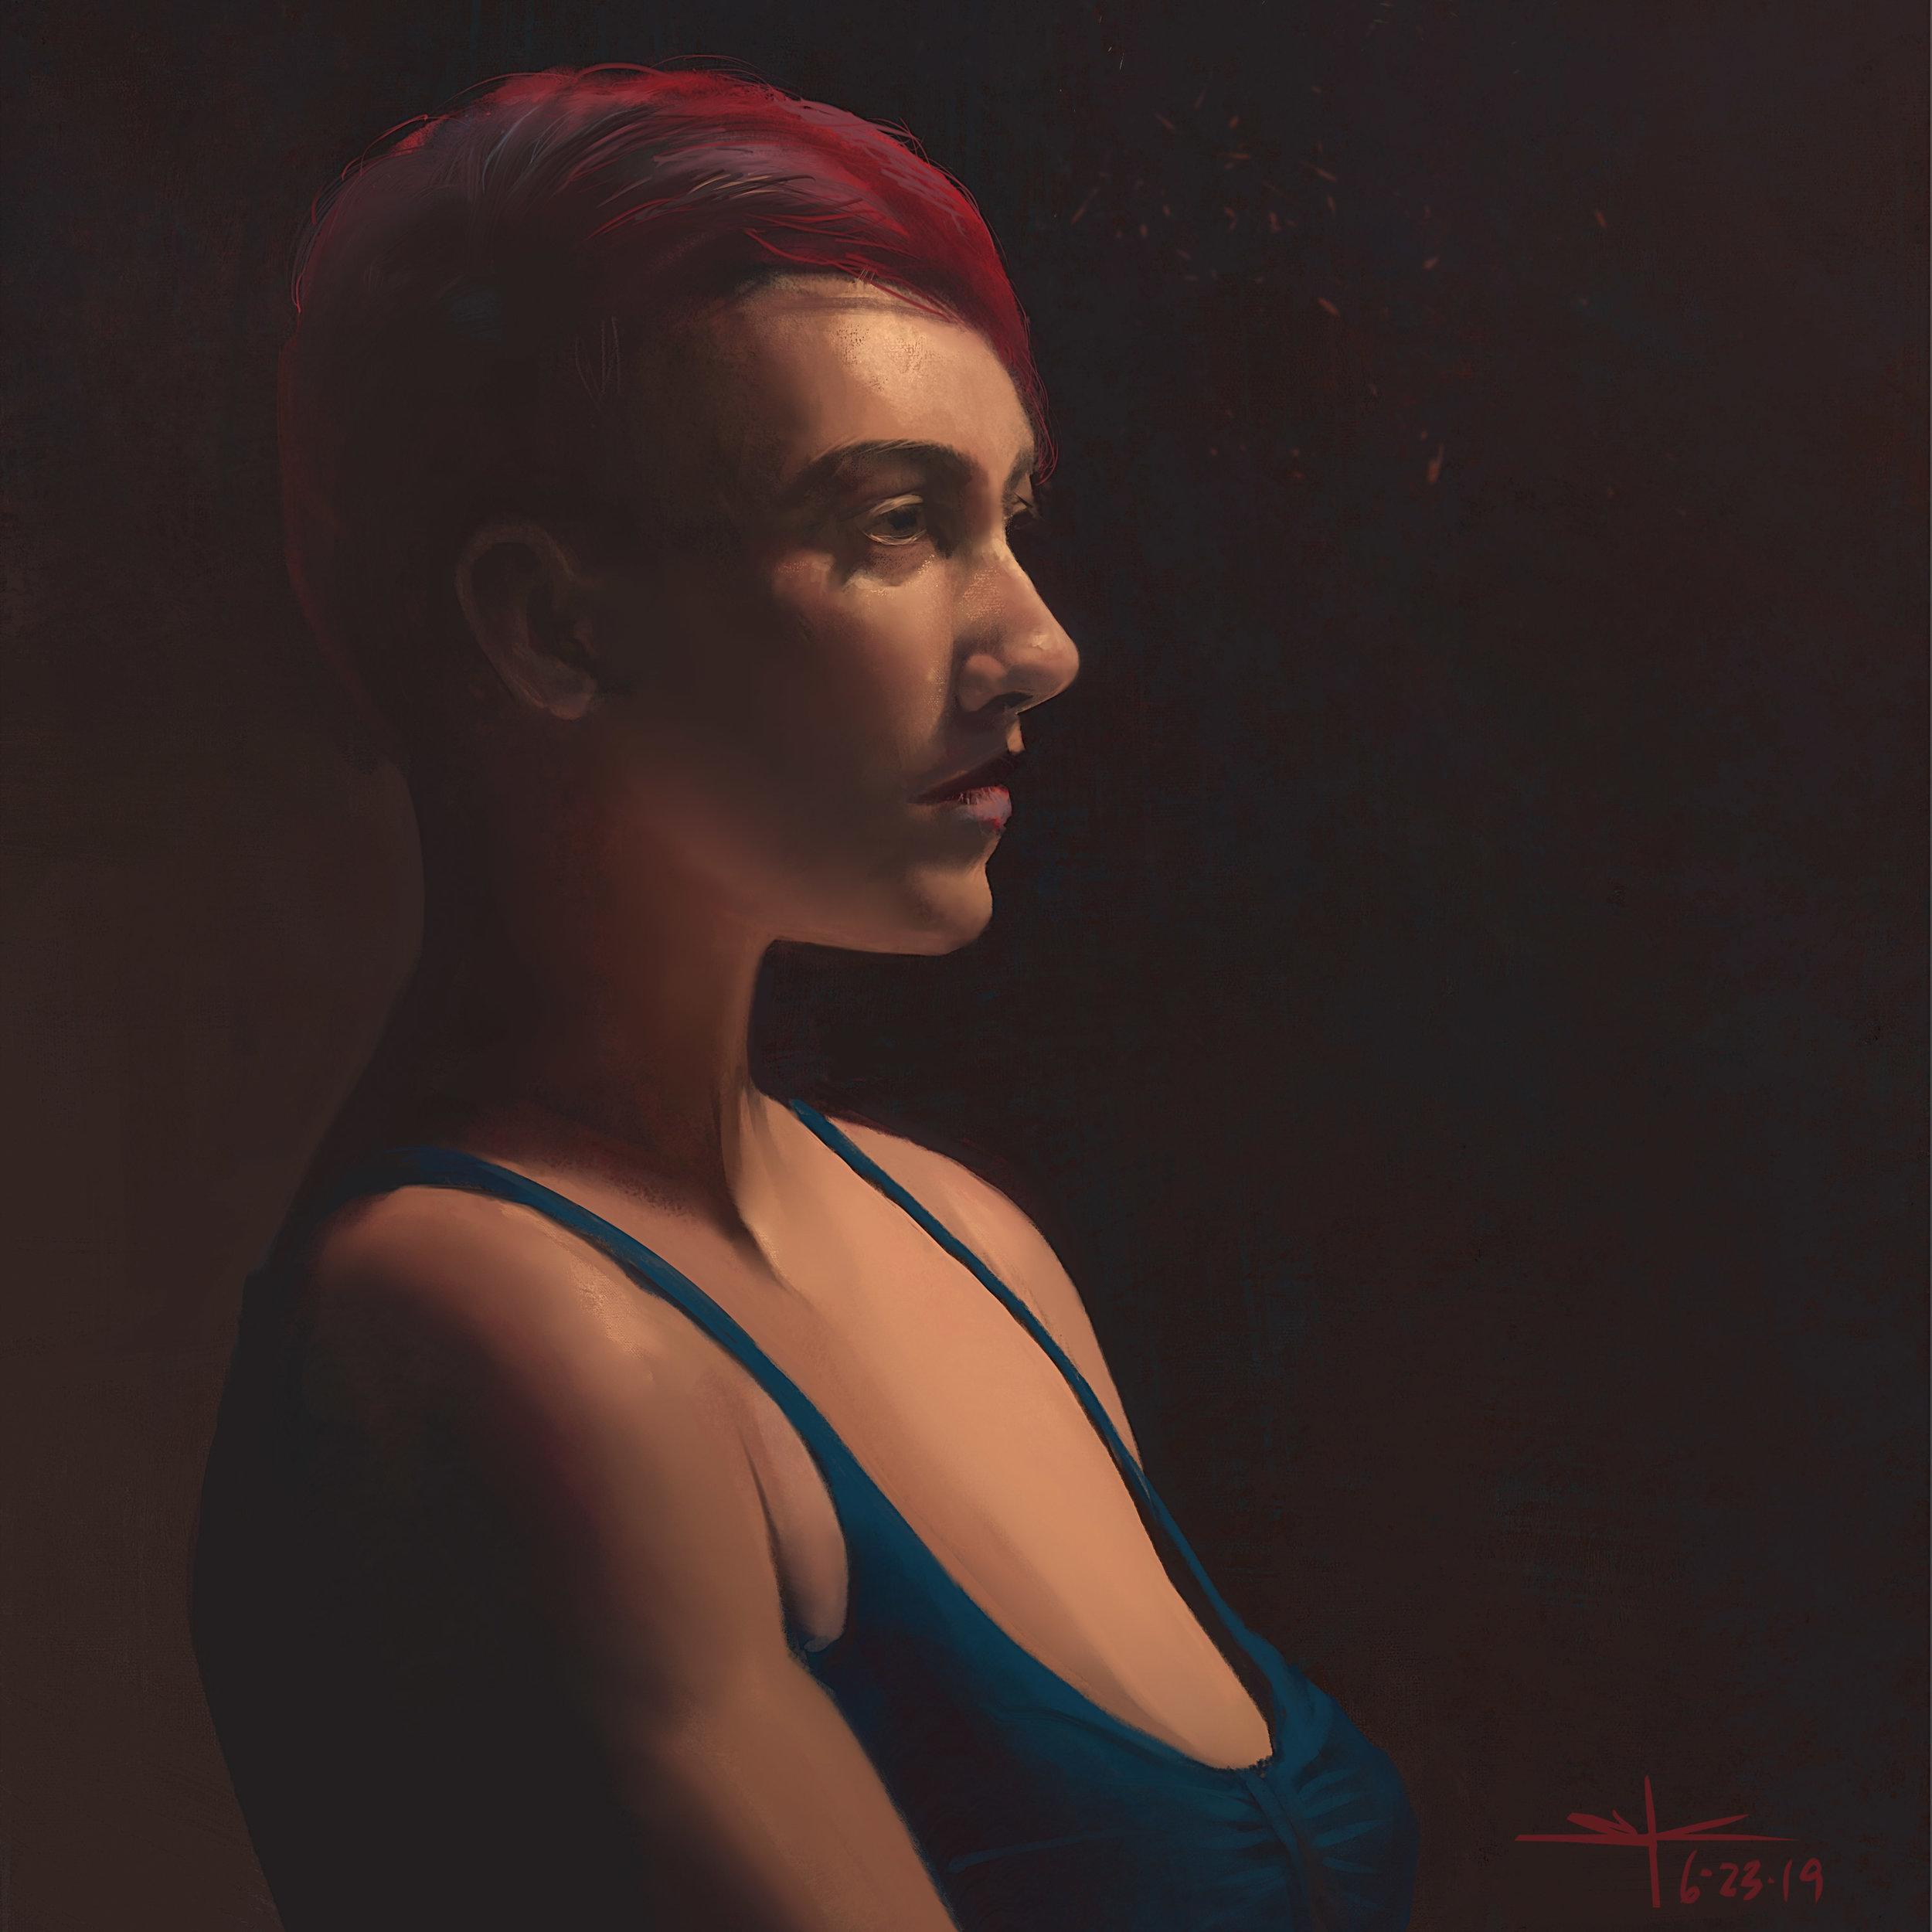 Janice-Atombombbody-SQ-web3K.jpg